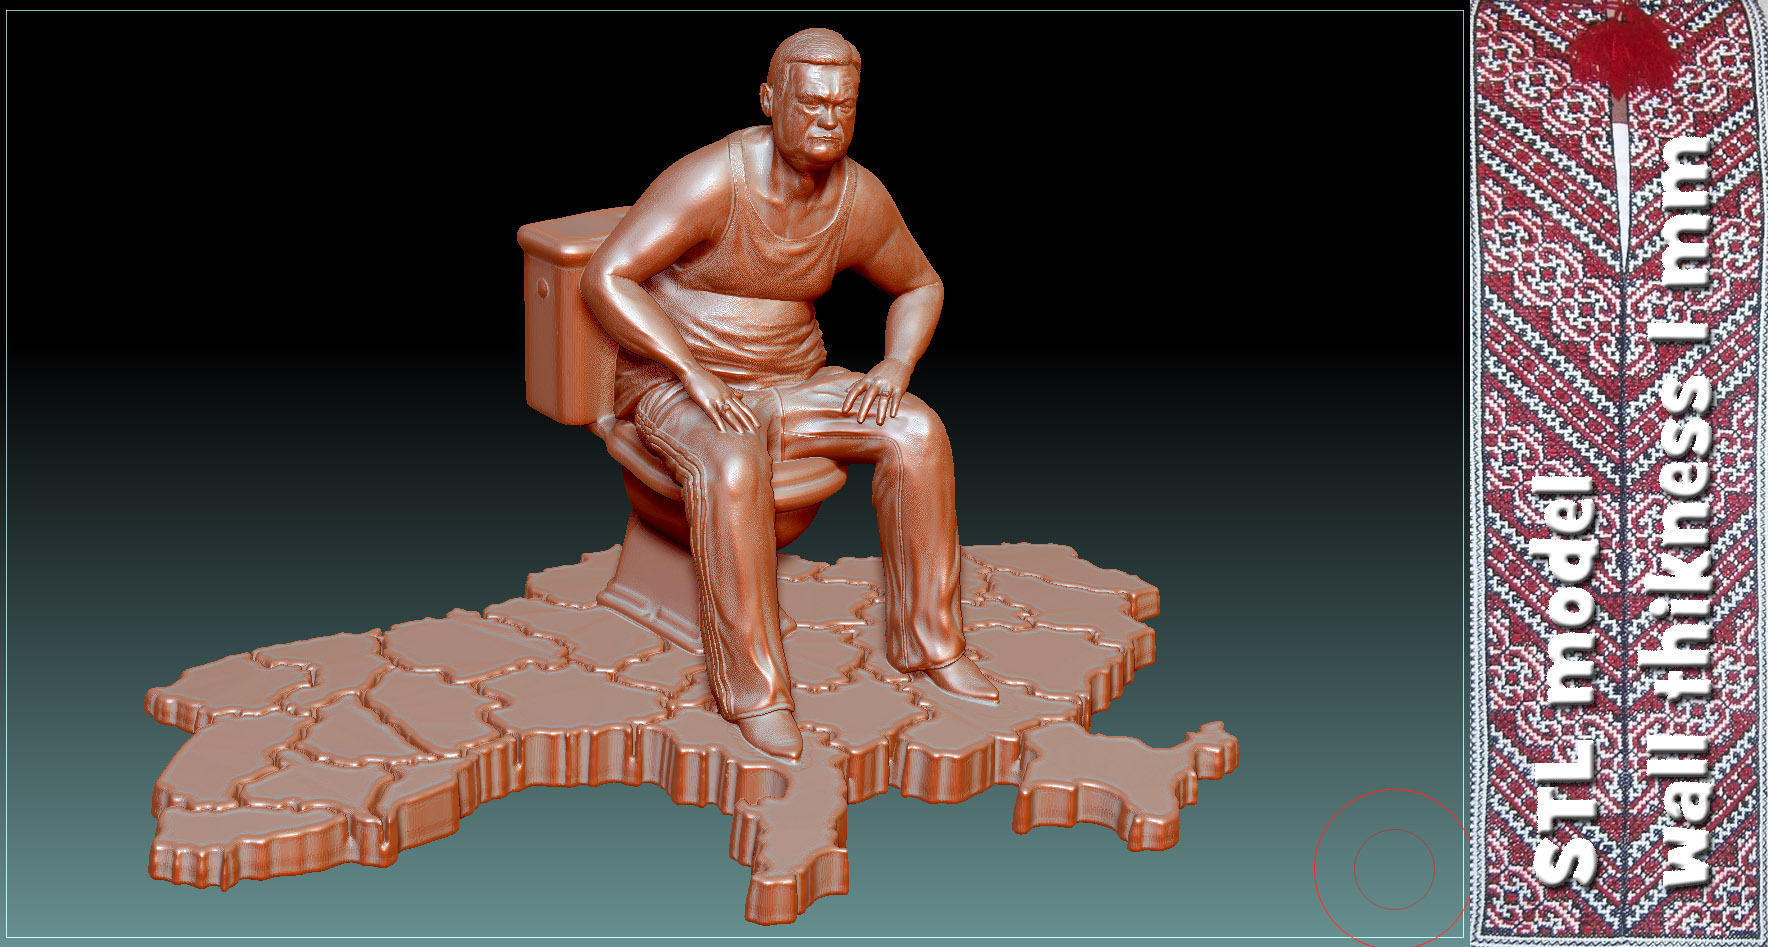 Monument to corruption stl